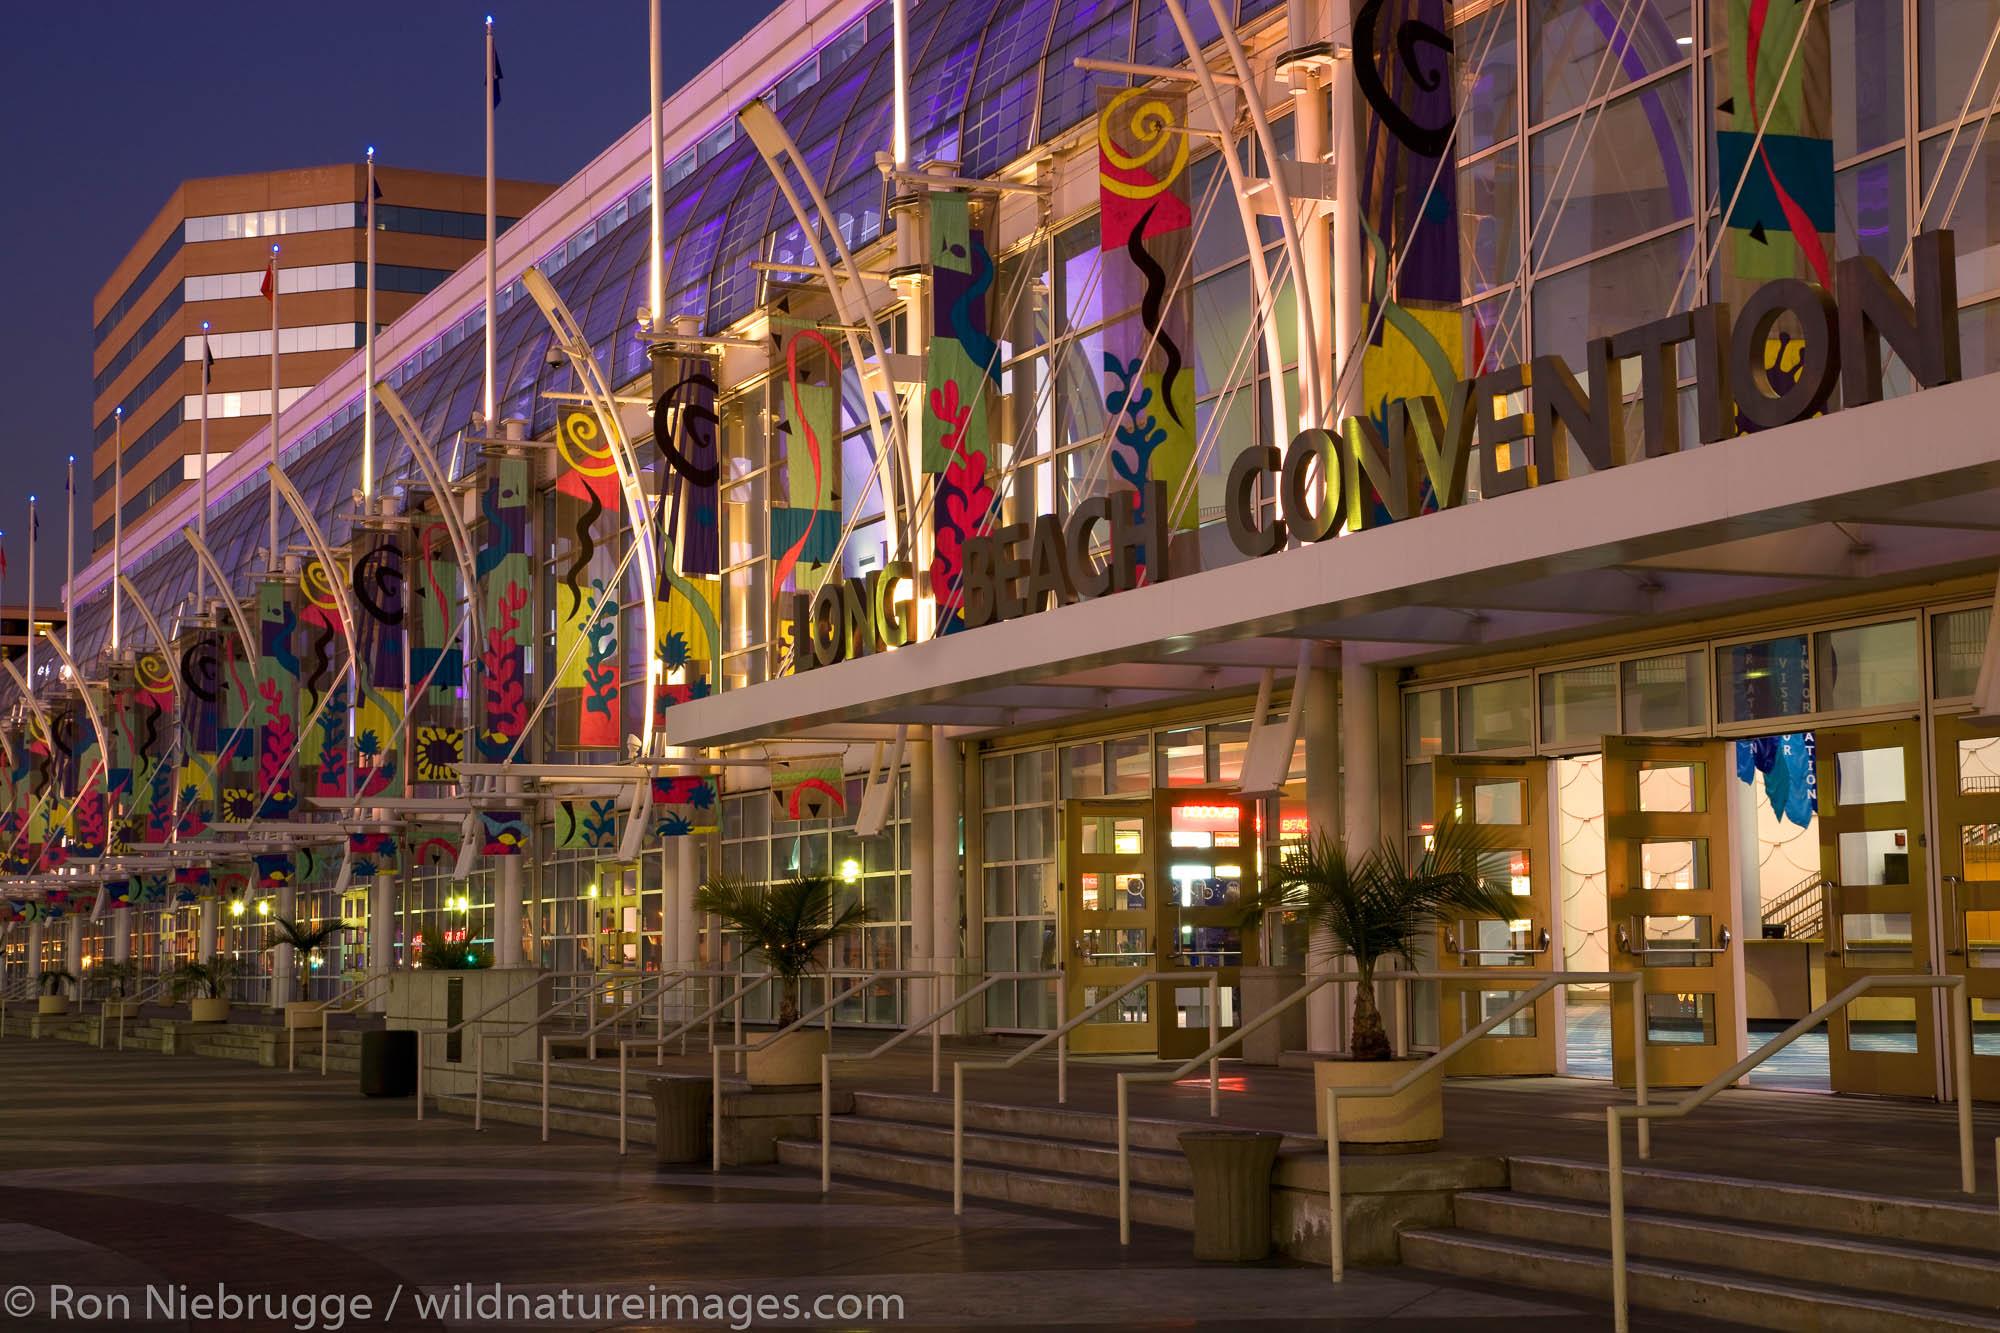 Long Beach Convention Center, Waterfront Center, Long Beach, California.